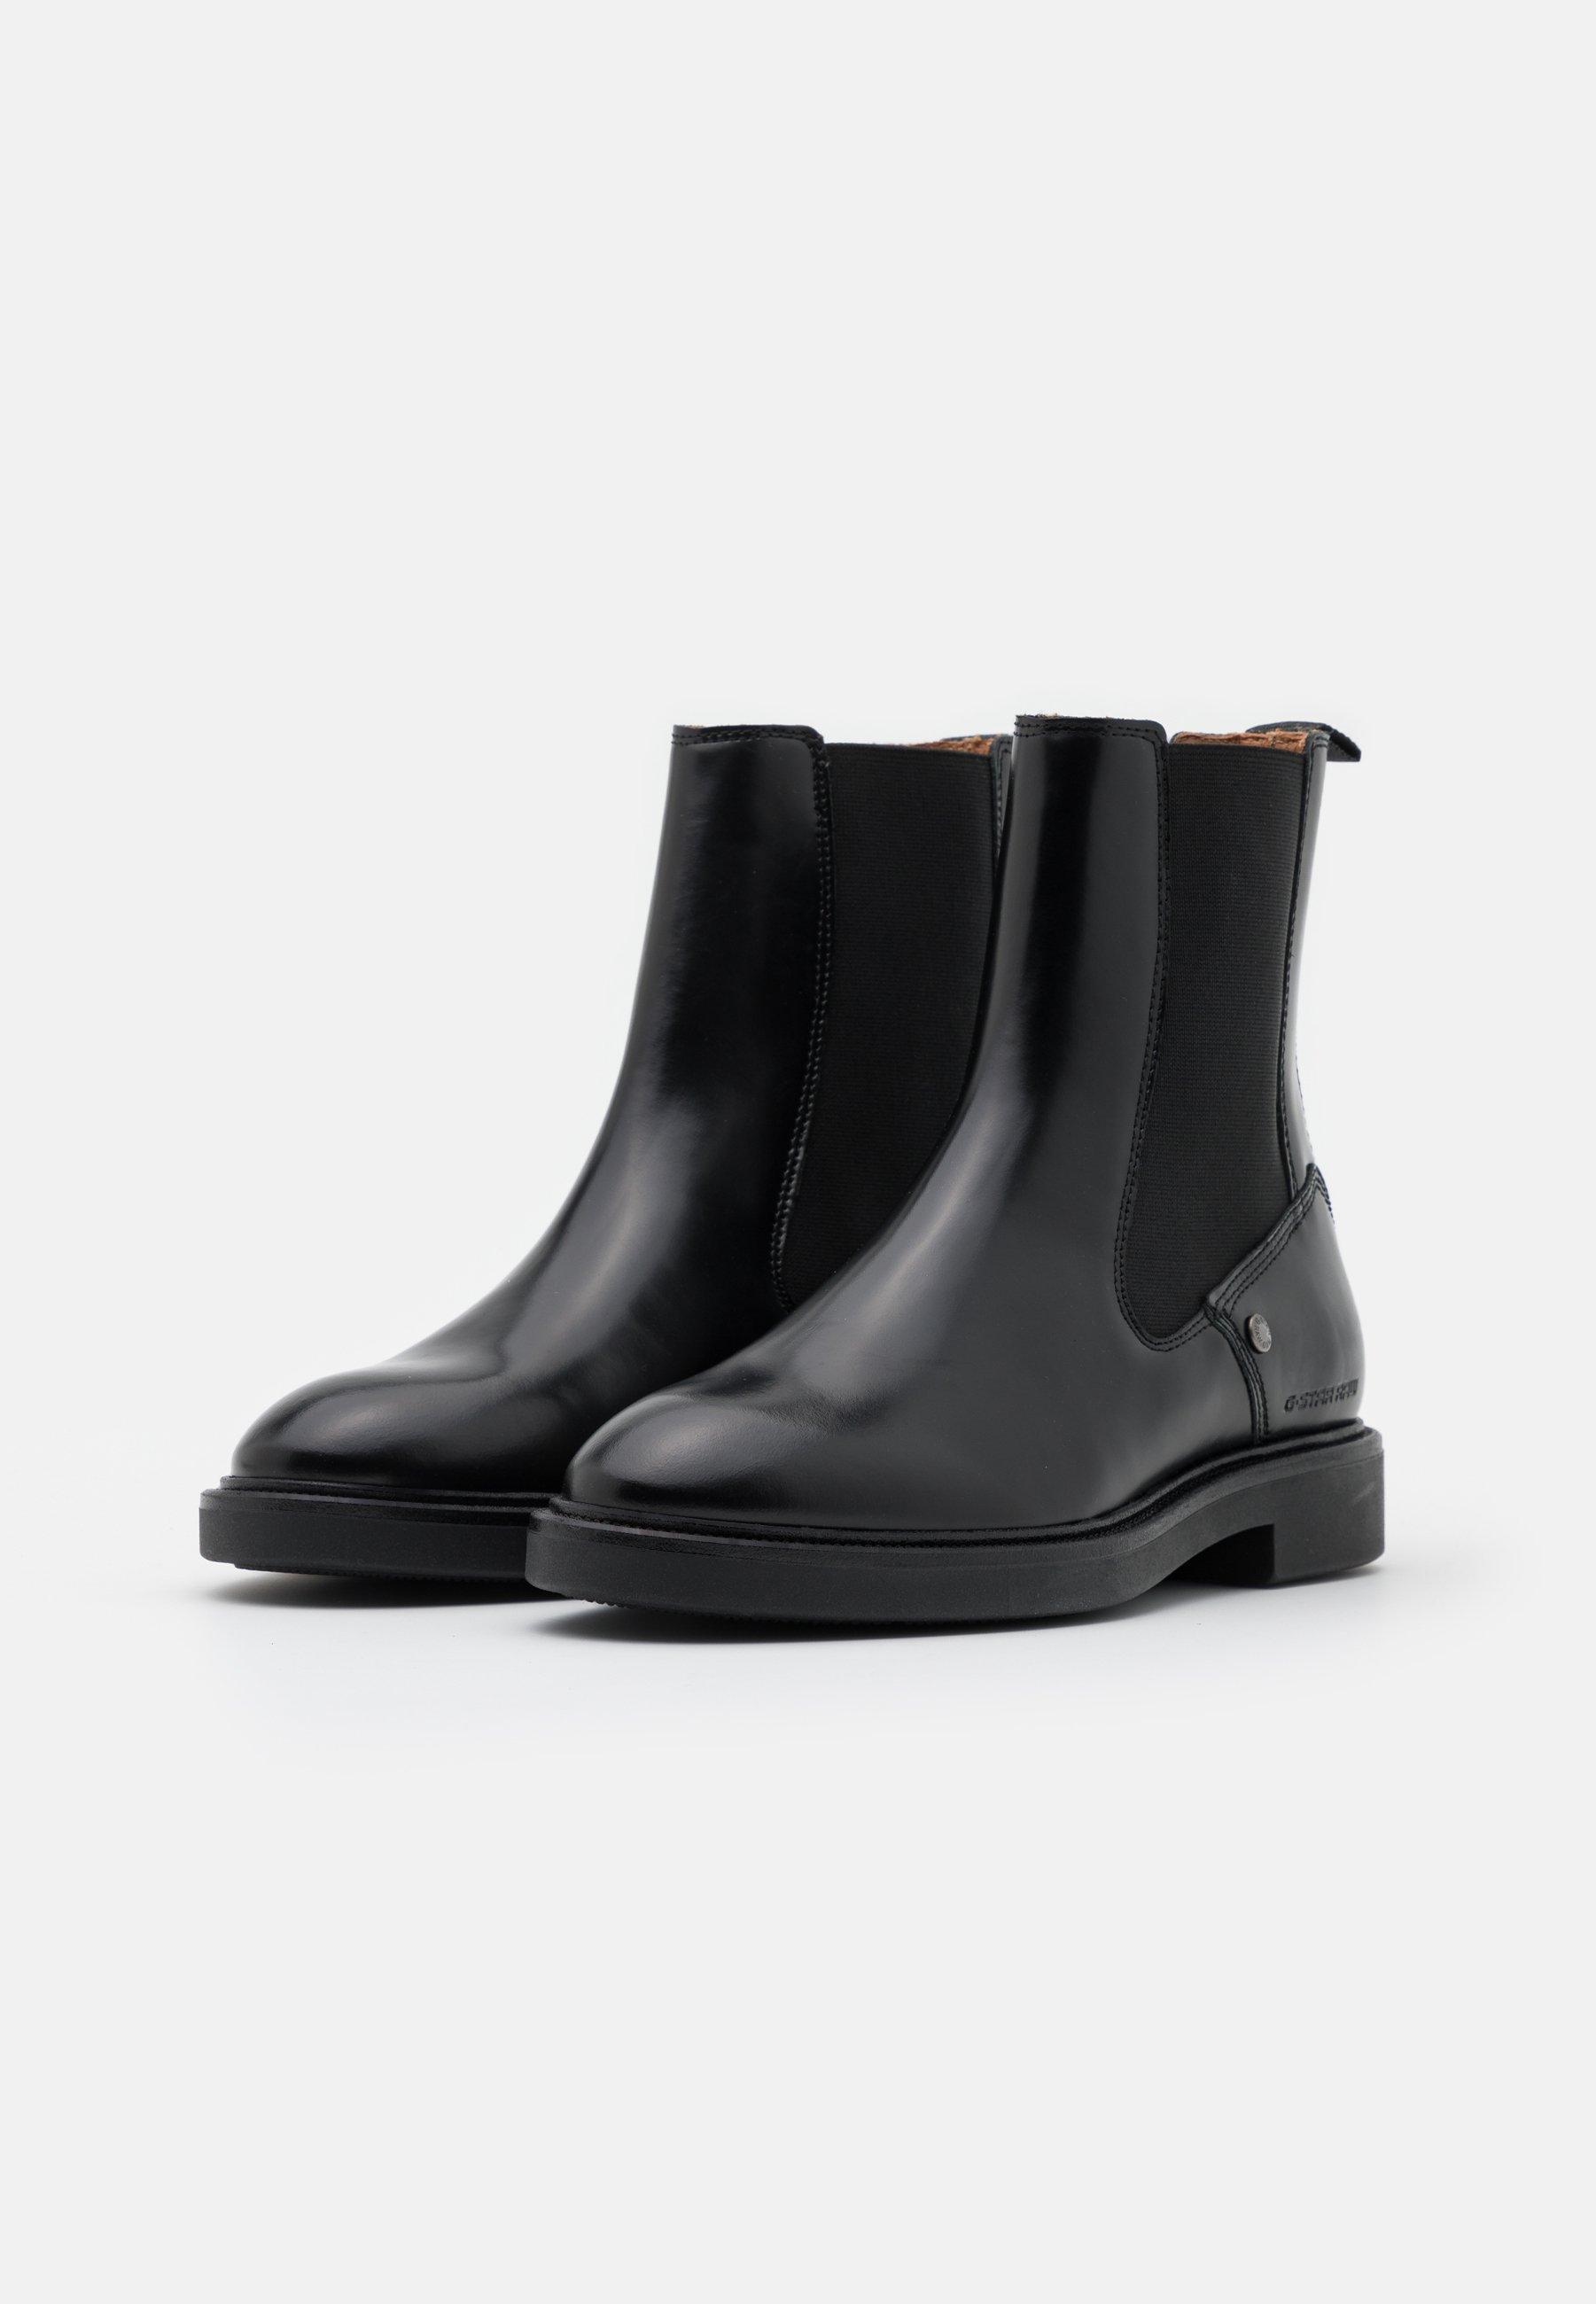 GStar CORBEL CHELSEA BOOT Stiefelette black/schwarz